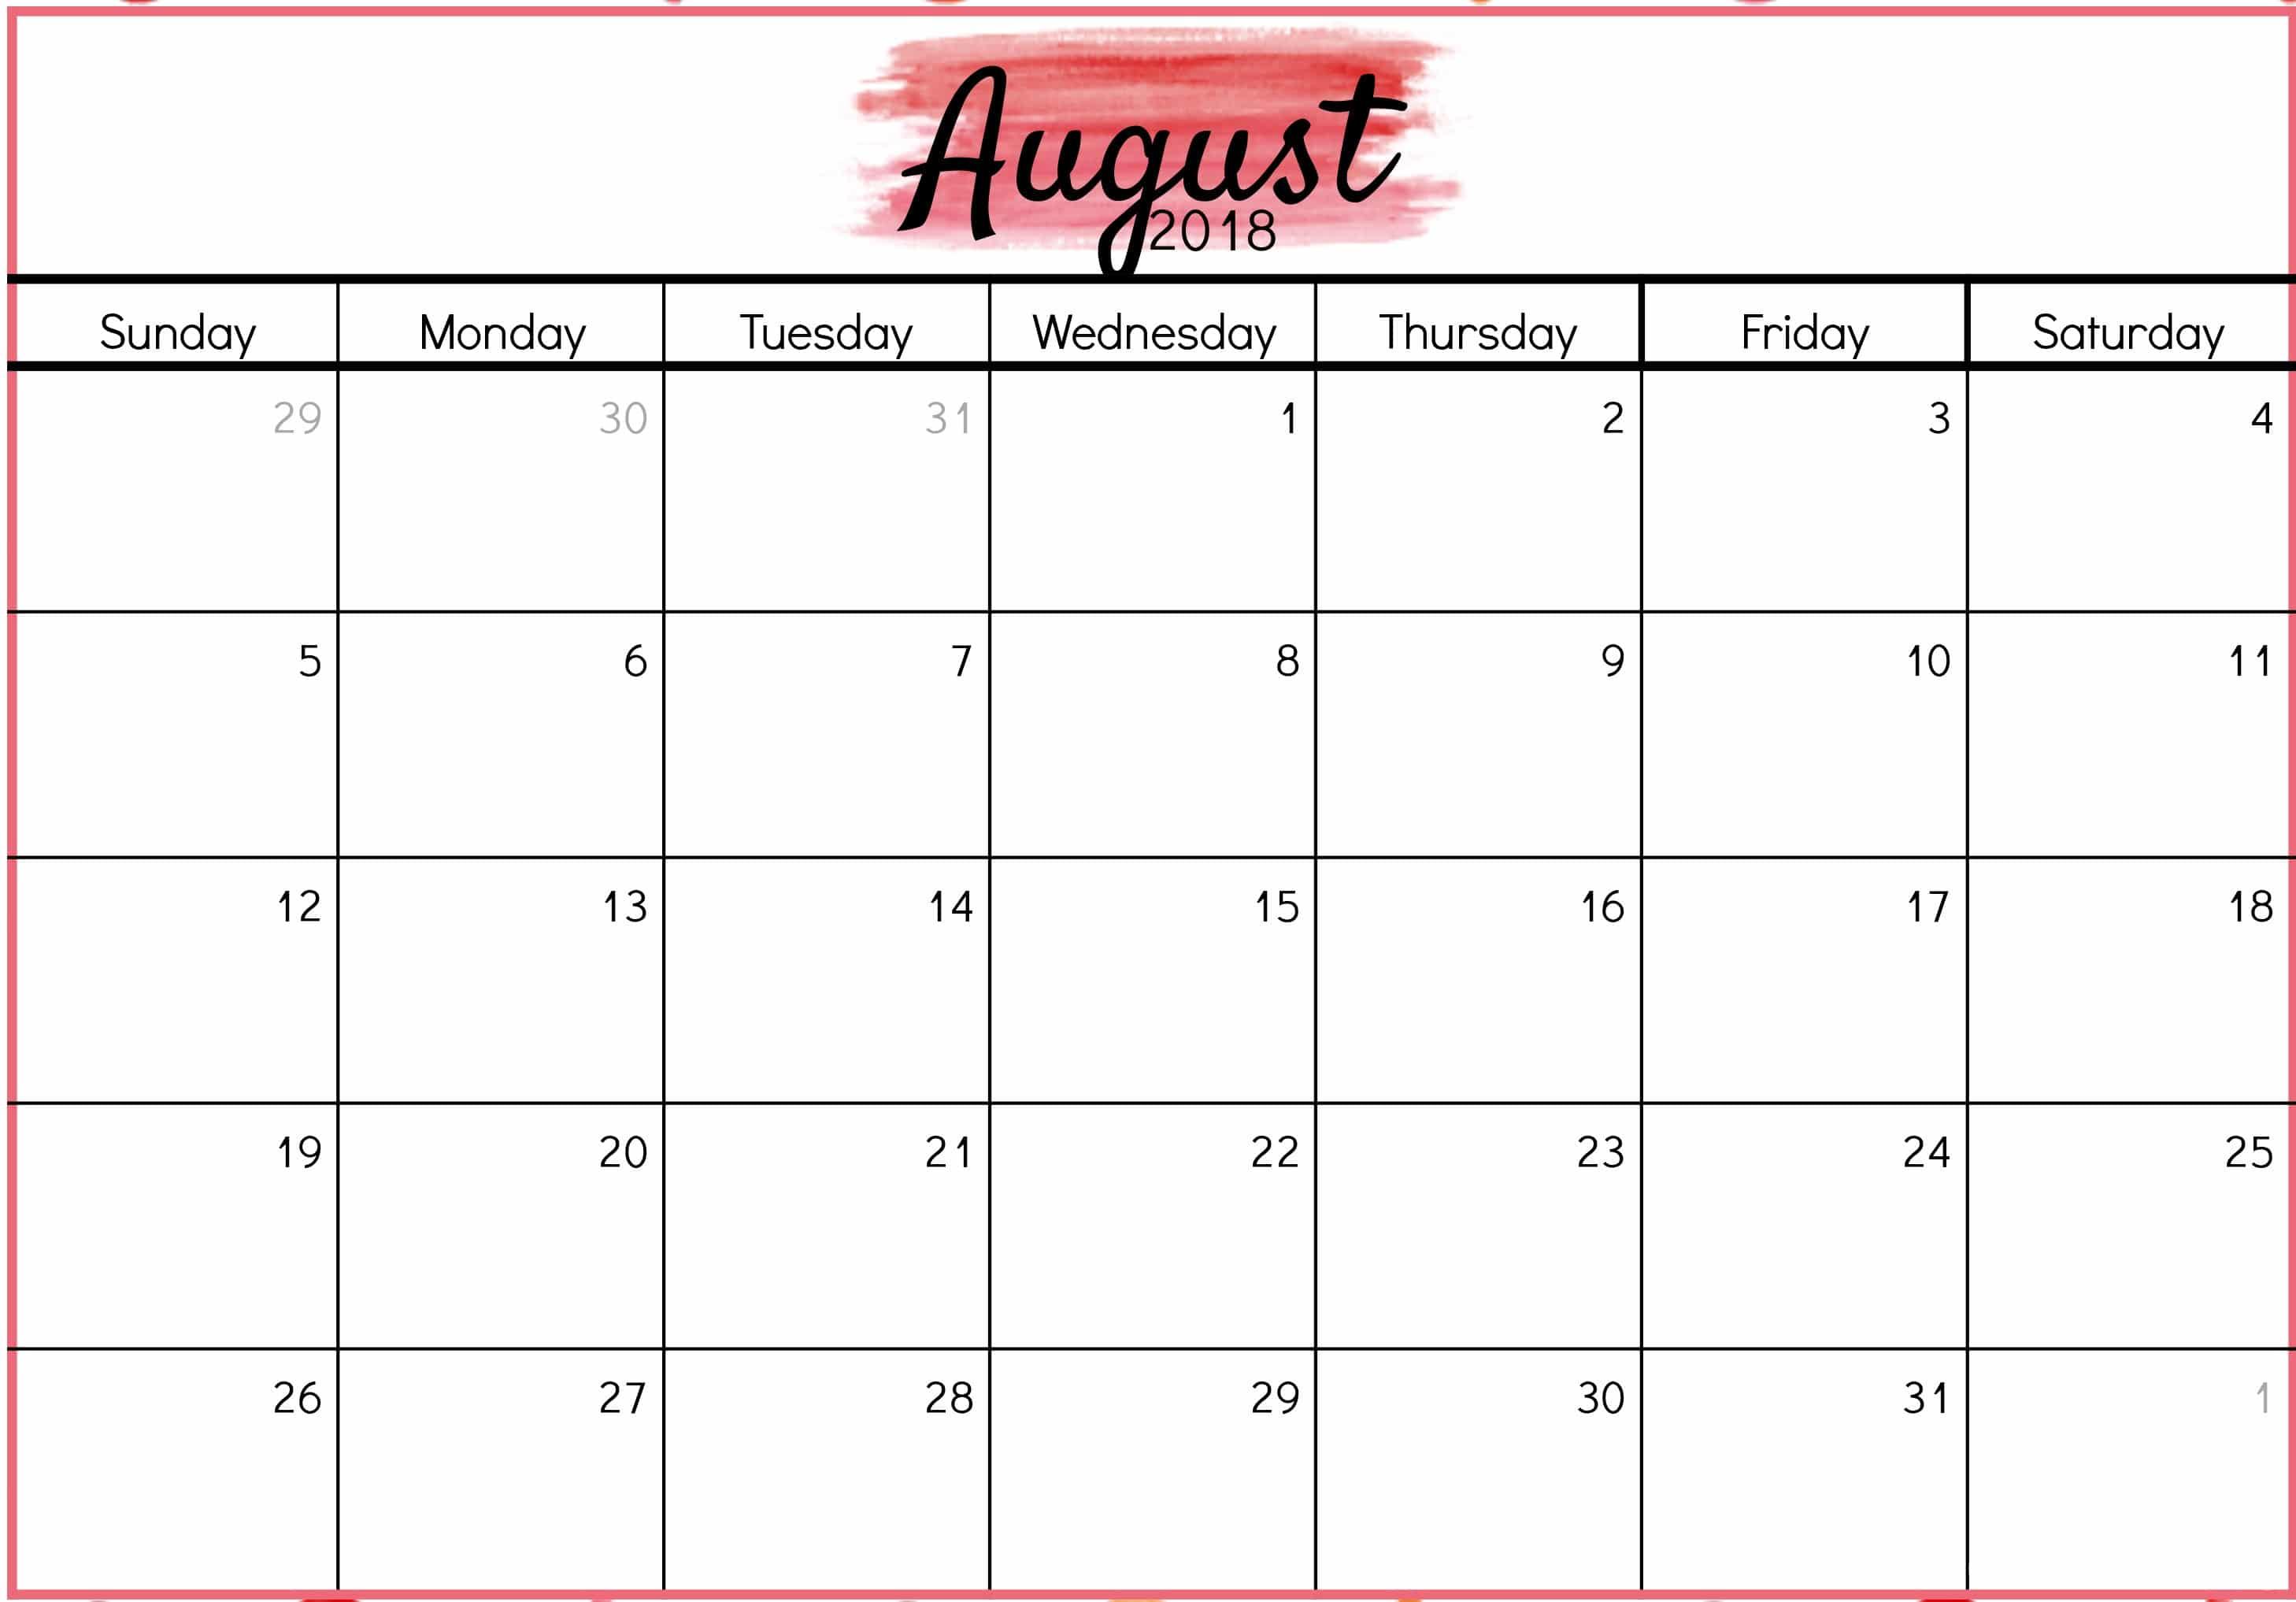 August Calendar 2018 Printable